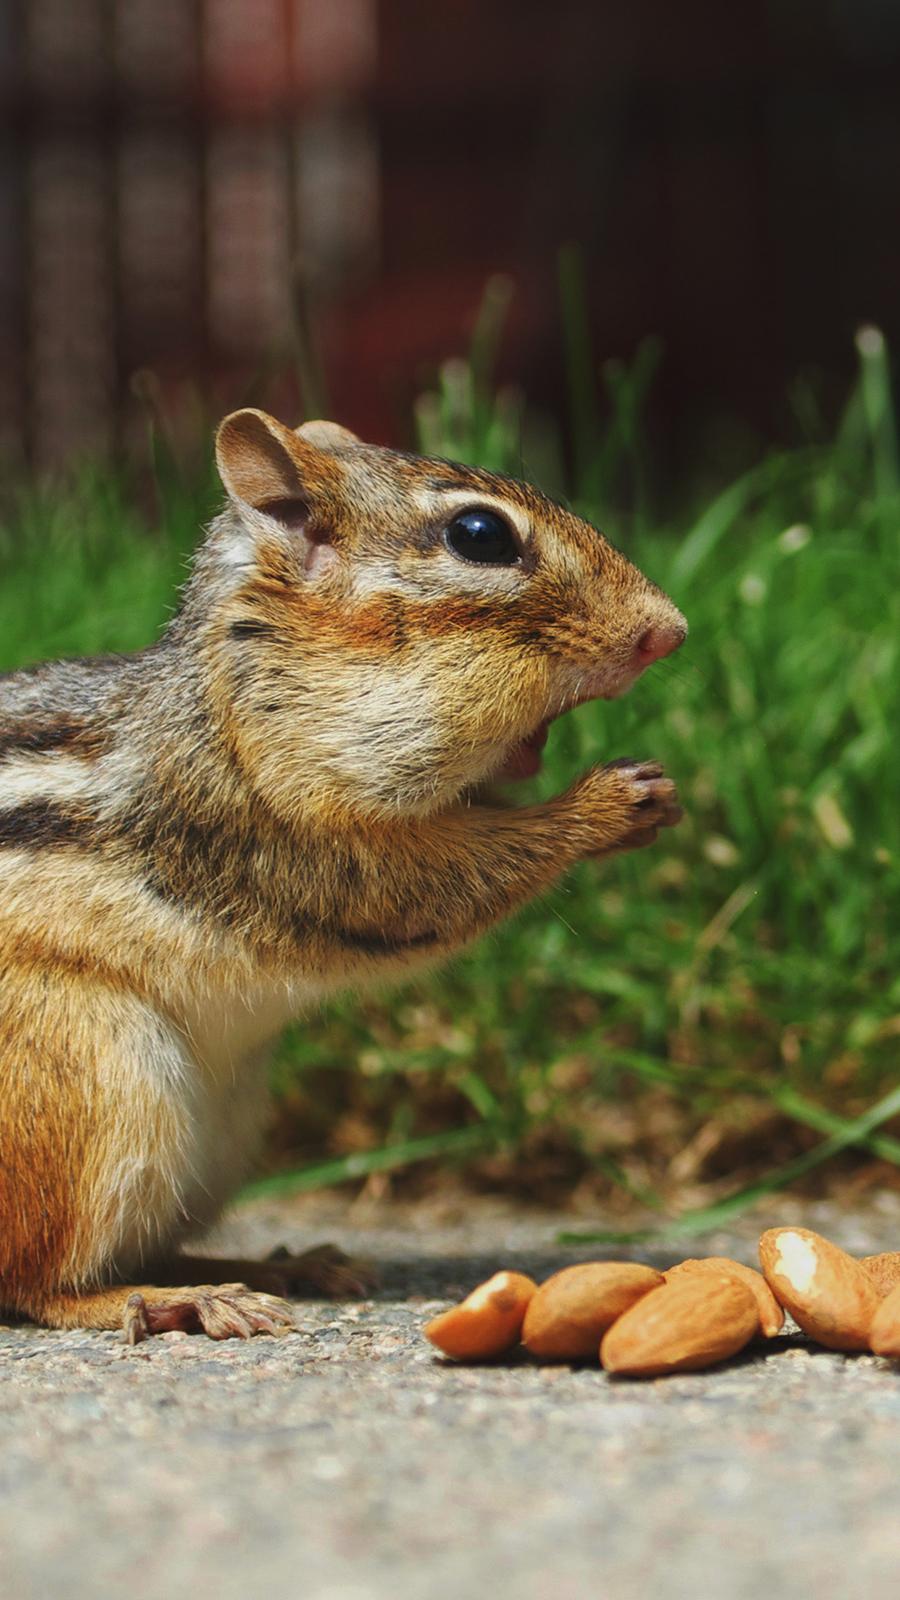 Cute Chipmunk Eating 4K Wallpapers Free Download